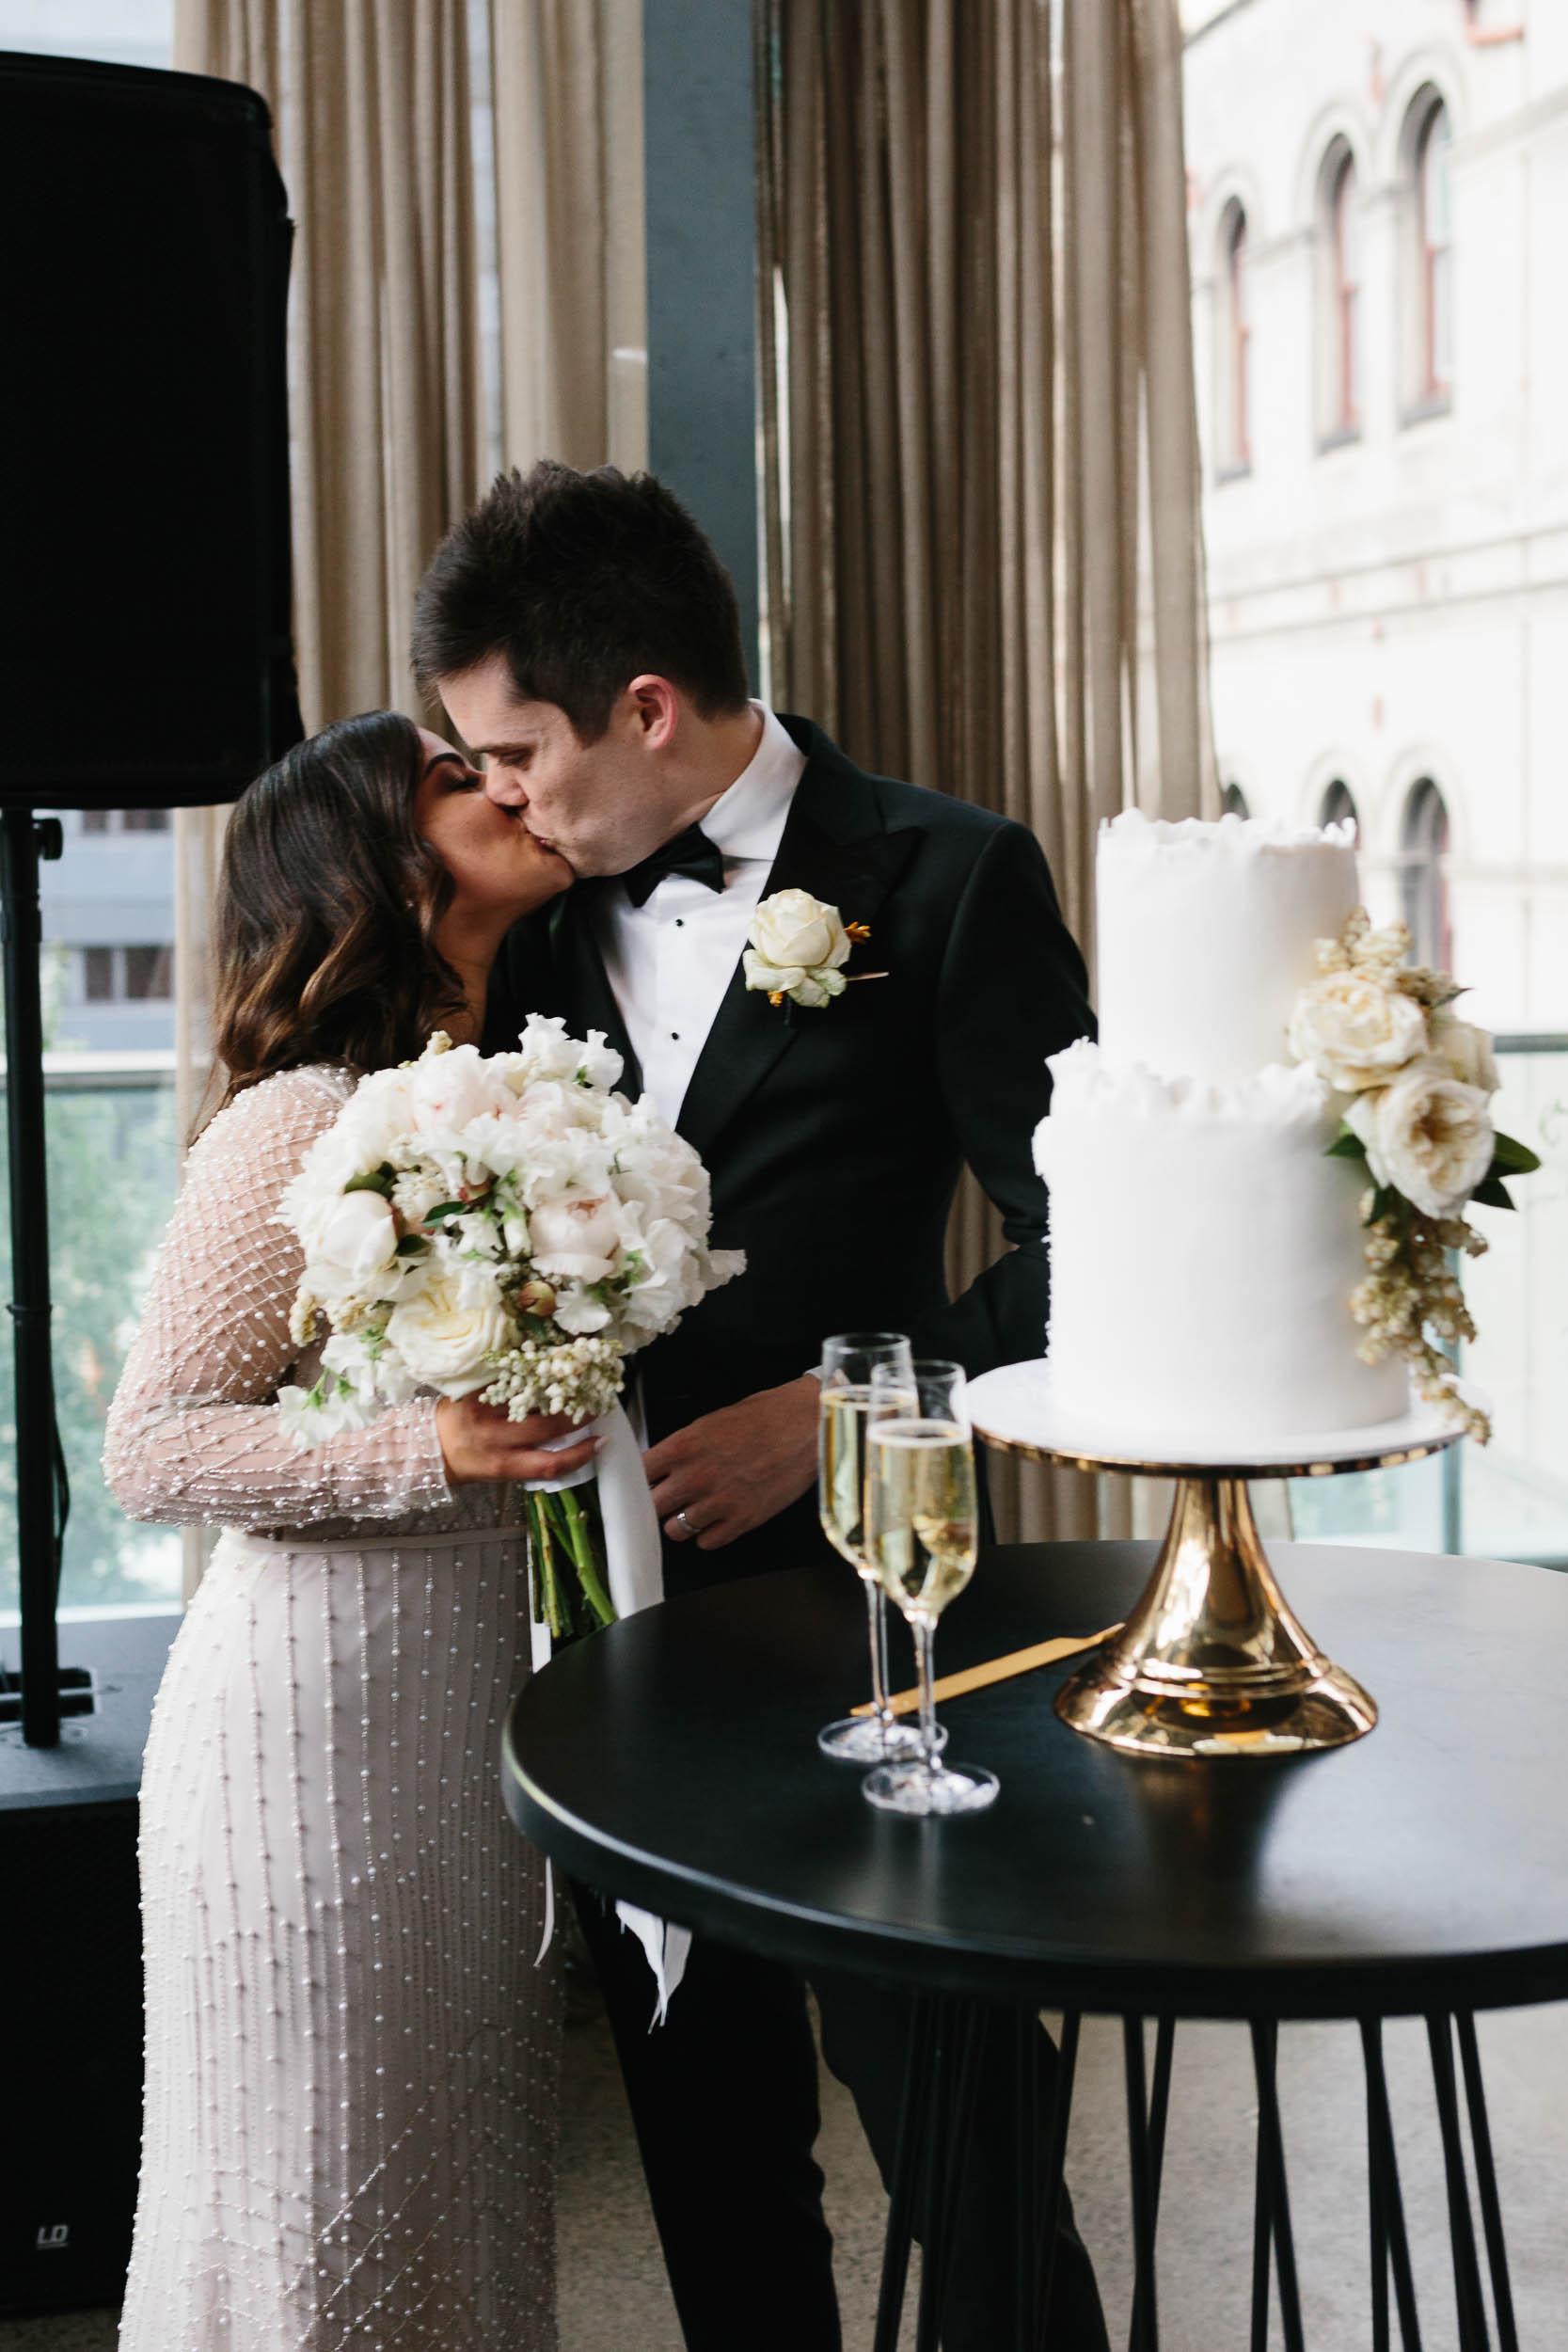 Kas-Richards-Wedding-Photographer-Melbourne-City-Wedding-Alto-Event-Space-Jane-Hill-Bridal-Gown-54.jpg